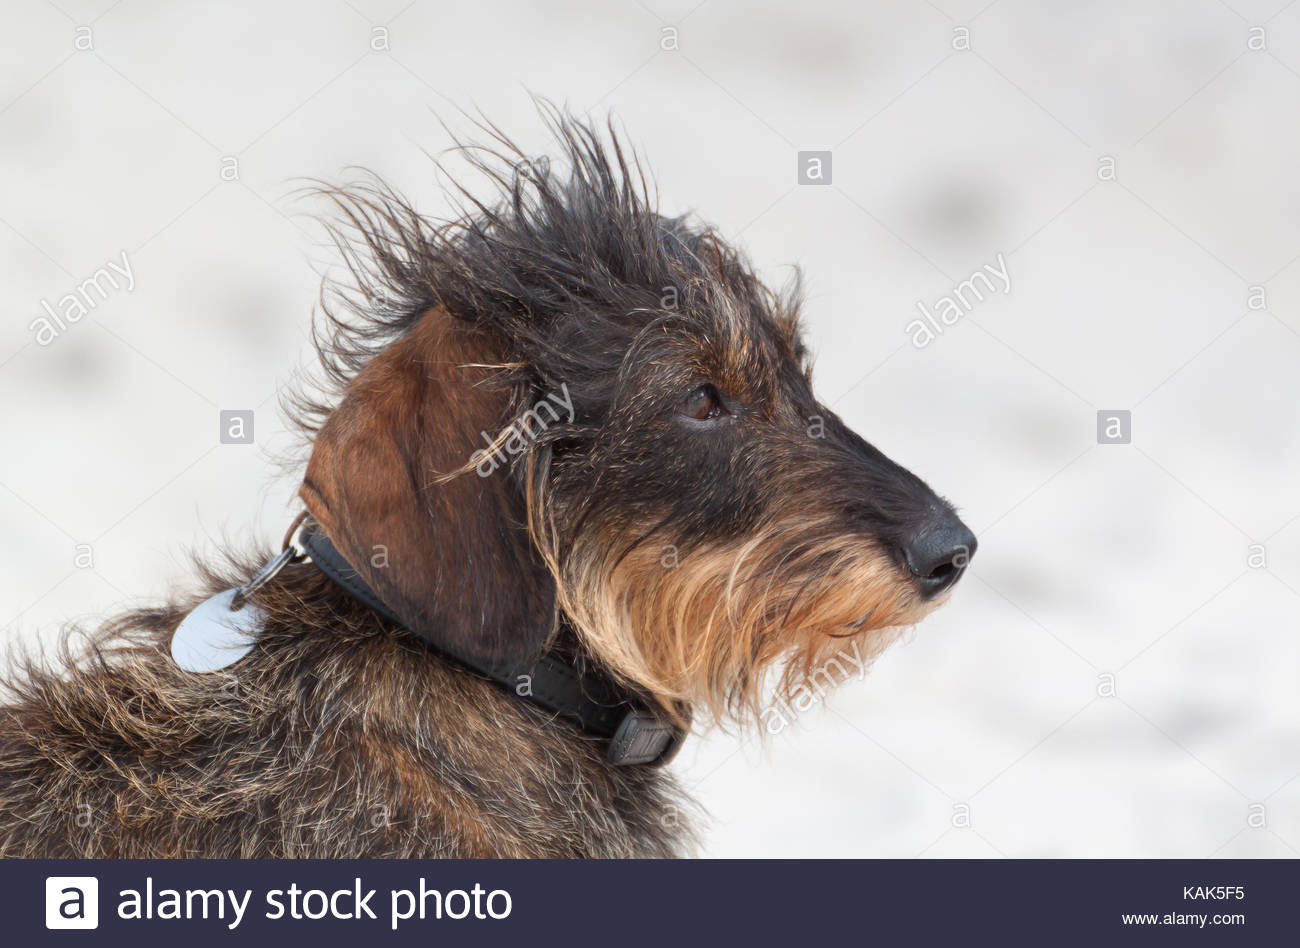 Cute shaggy dachshund sitting on the beach. - Stock Image